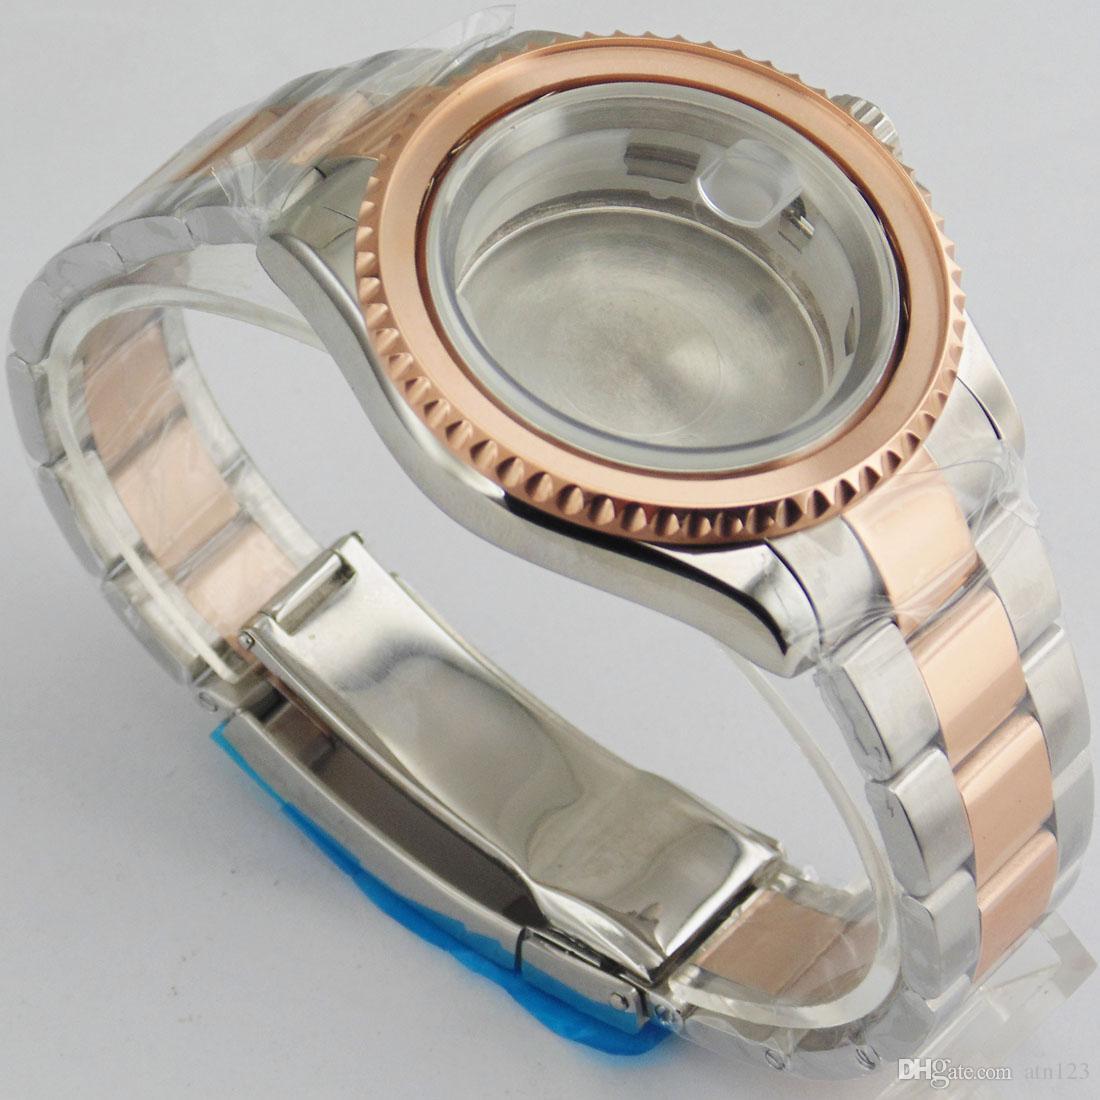 40mm Roségold Uhrengehäuse für ETA 2836 DG2813 / 3804 Miyota 82Series Hochwertiges Stanless Stahl Uhrengehäuse P563